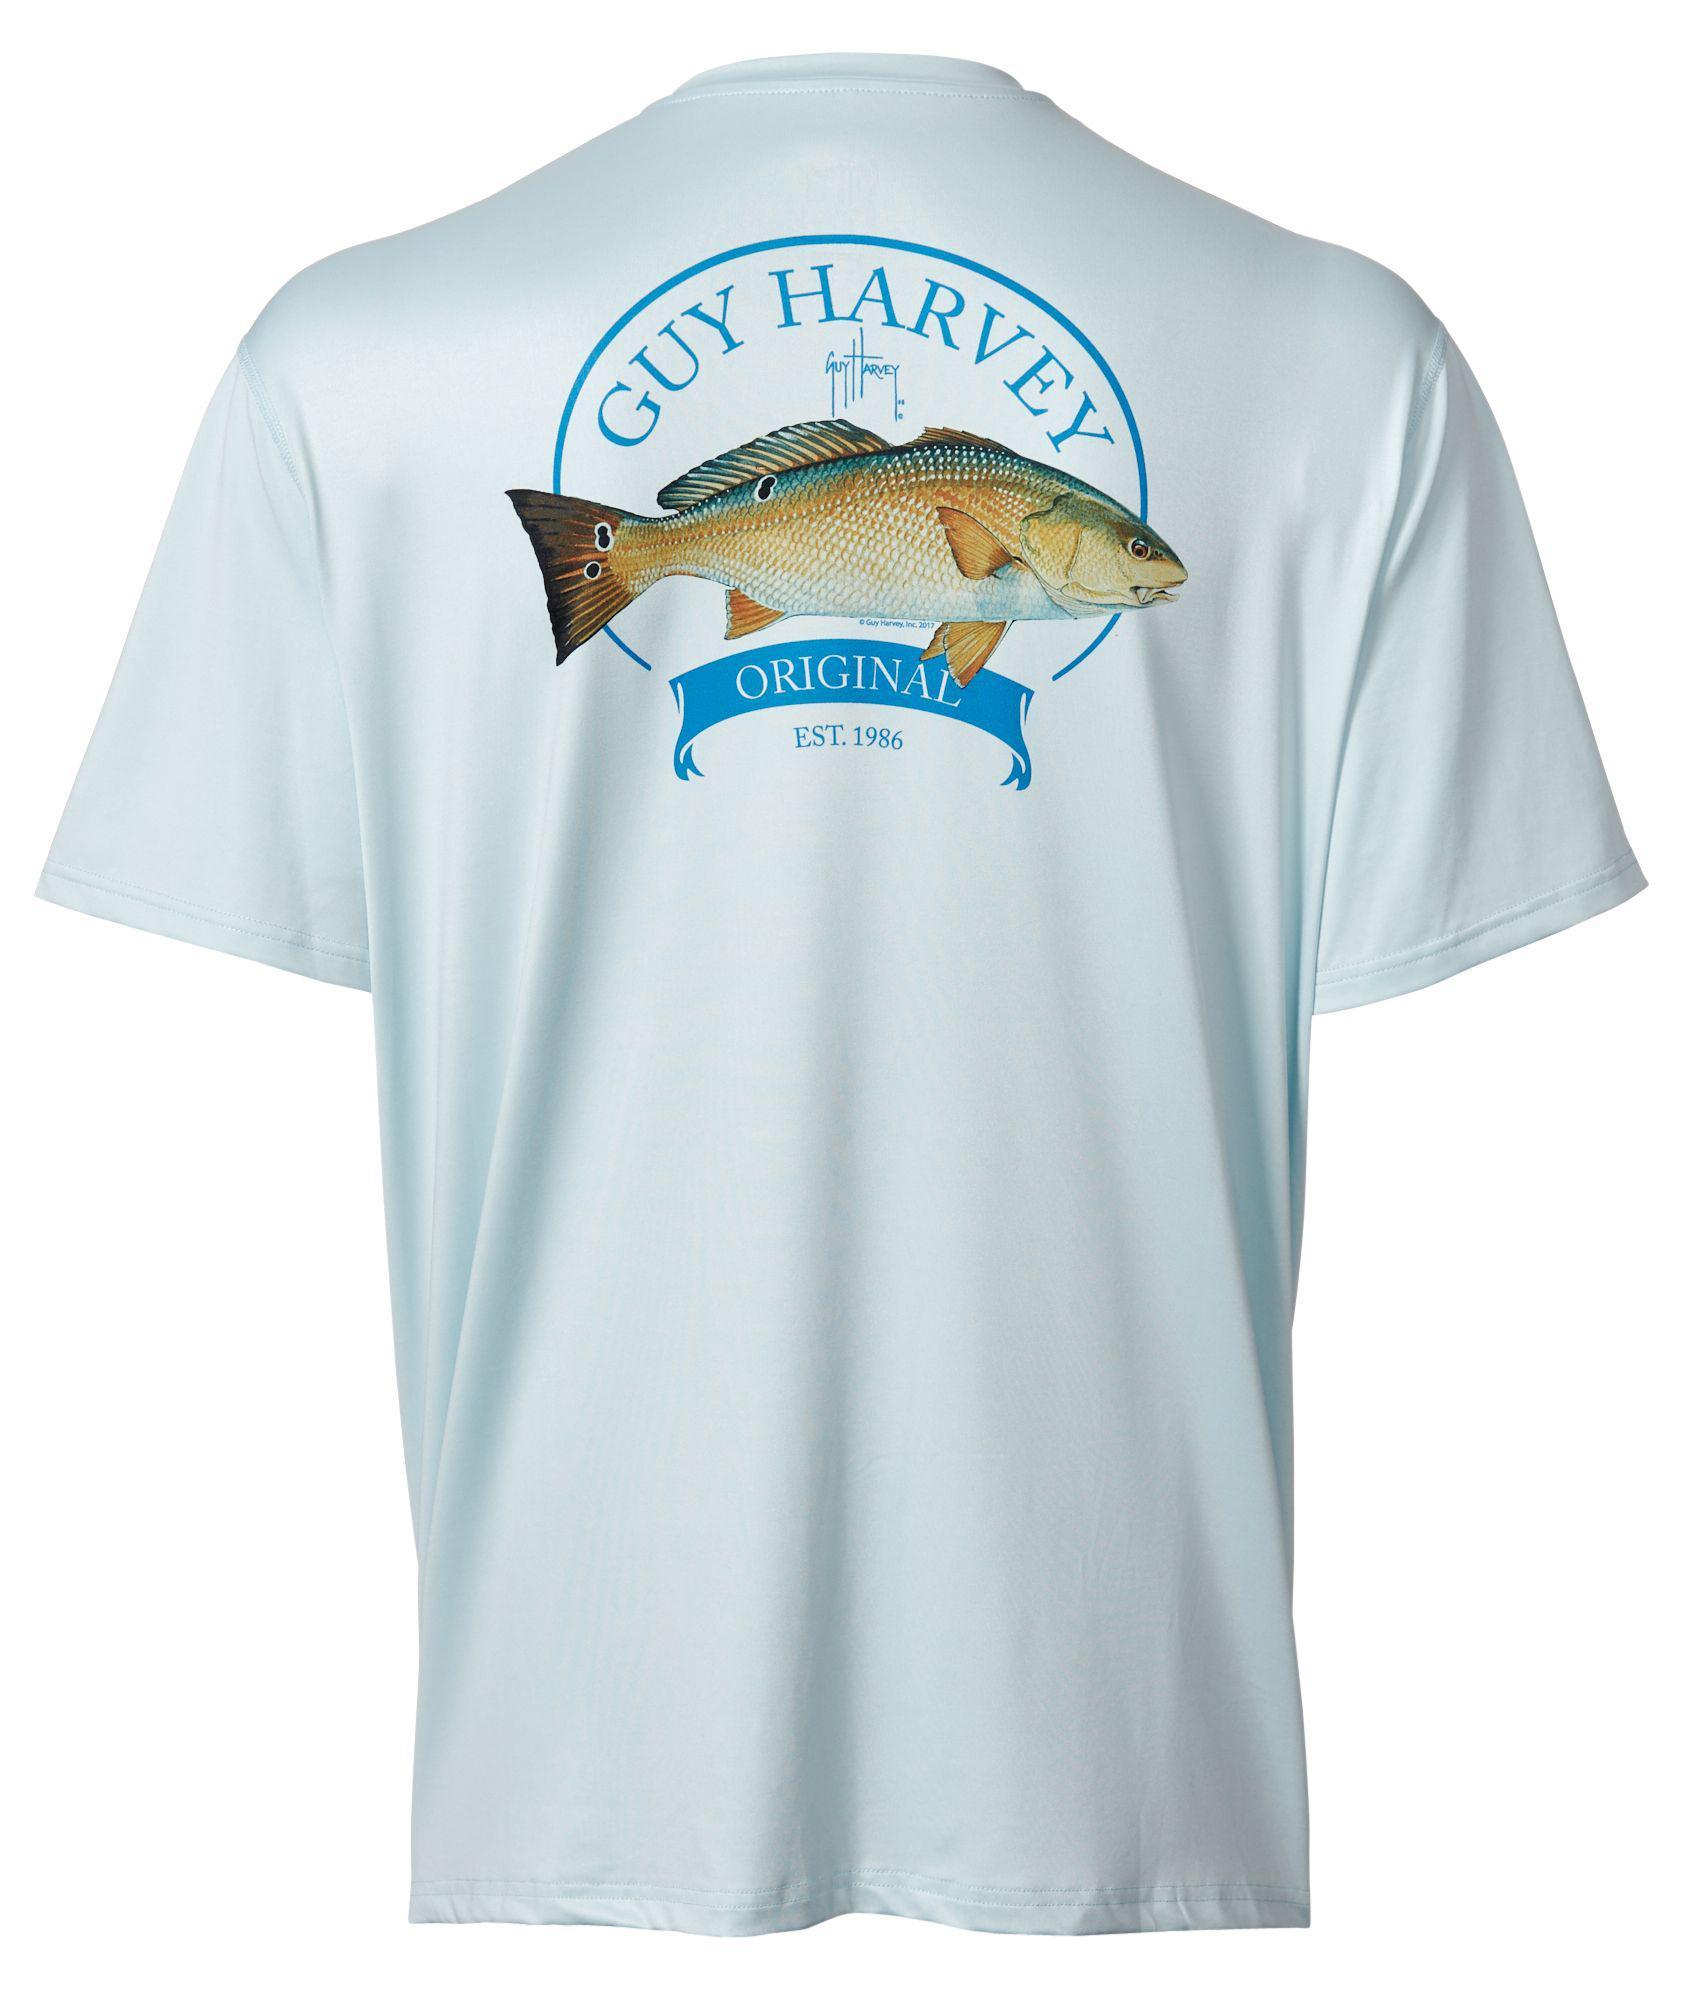 1d5e8043a8a6b Guy Harvey Shirts Men